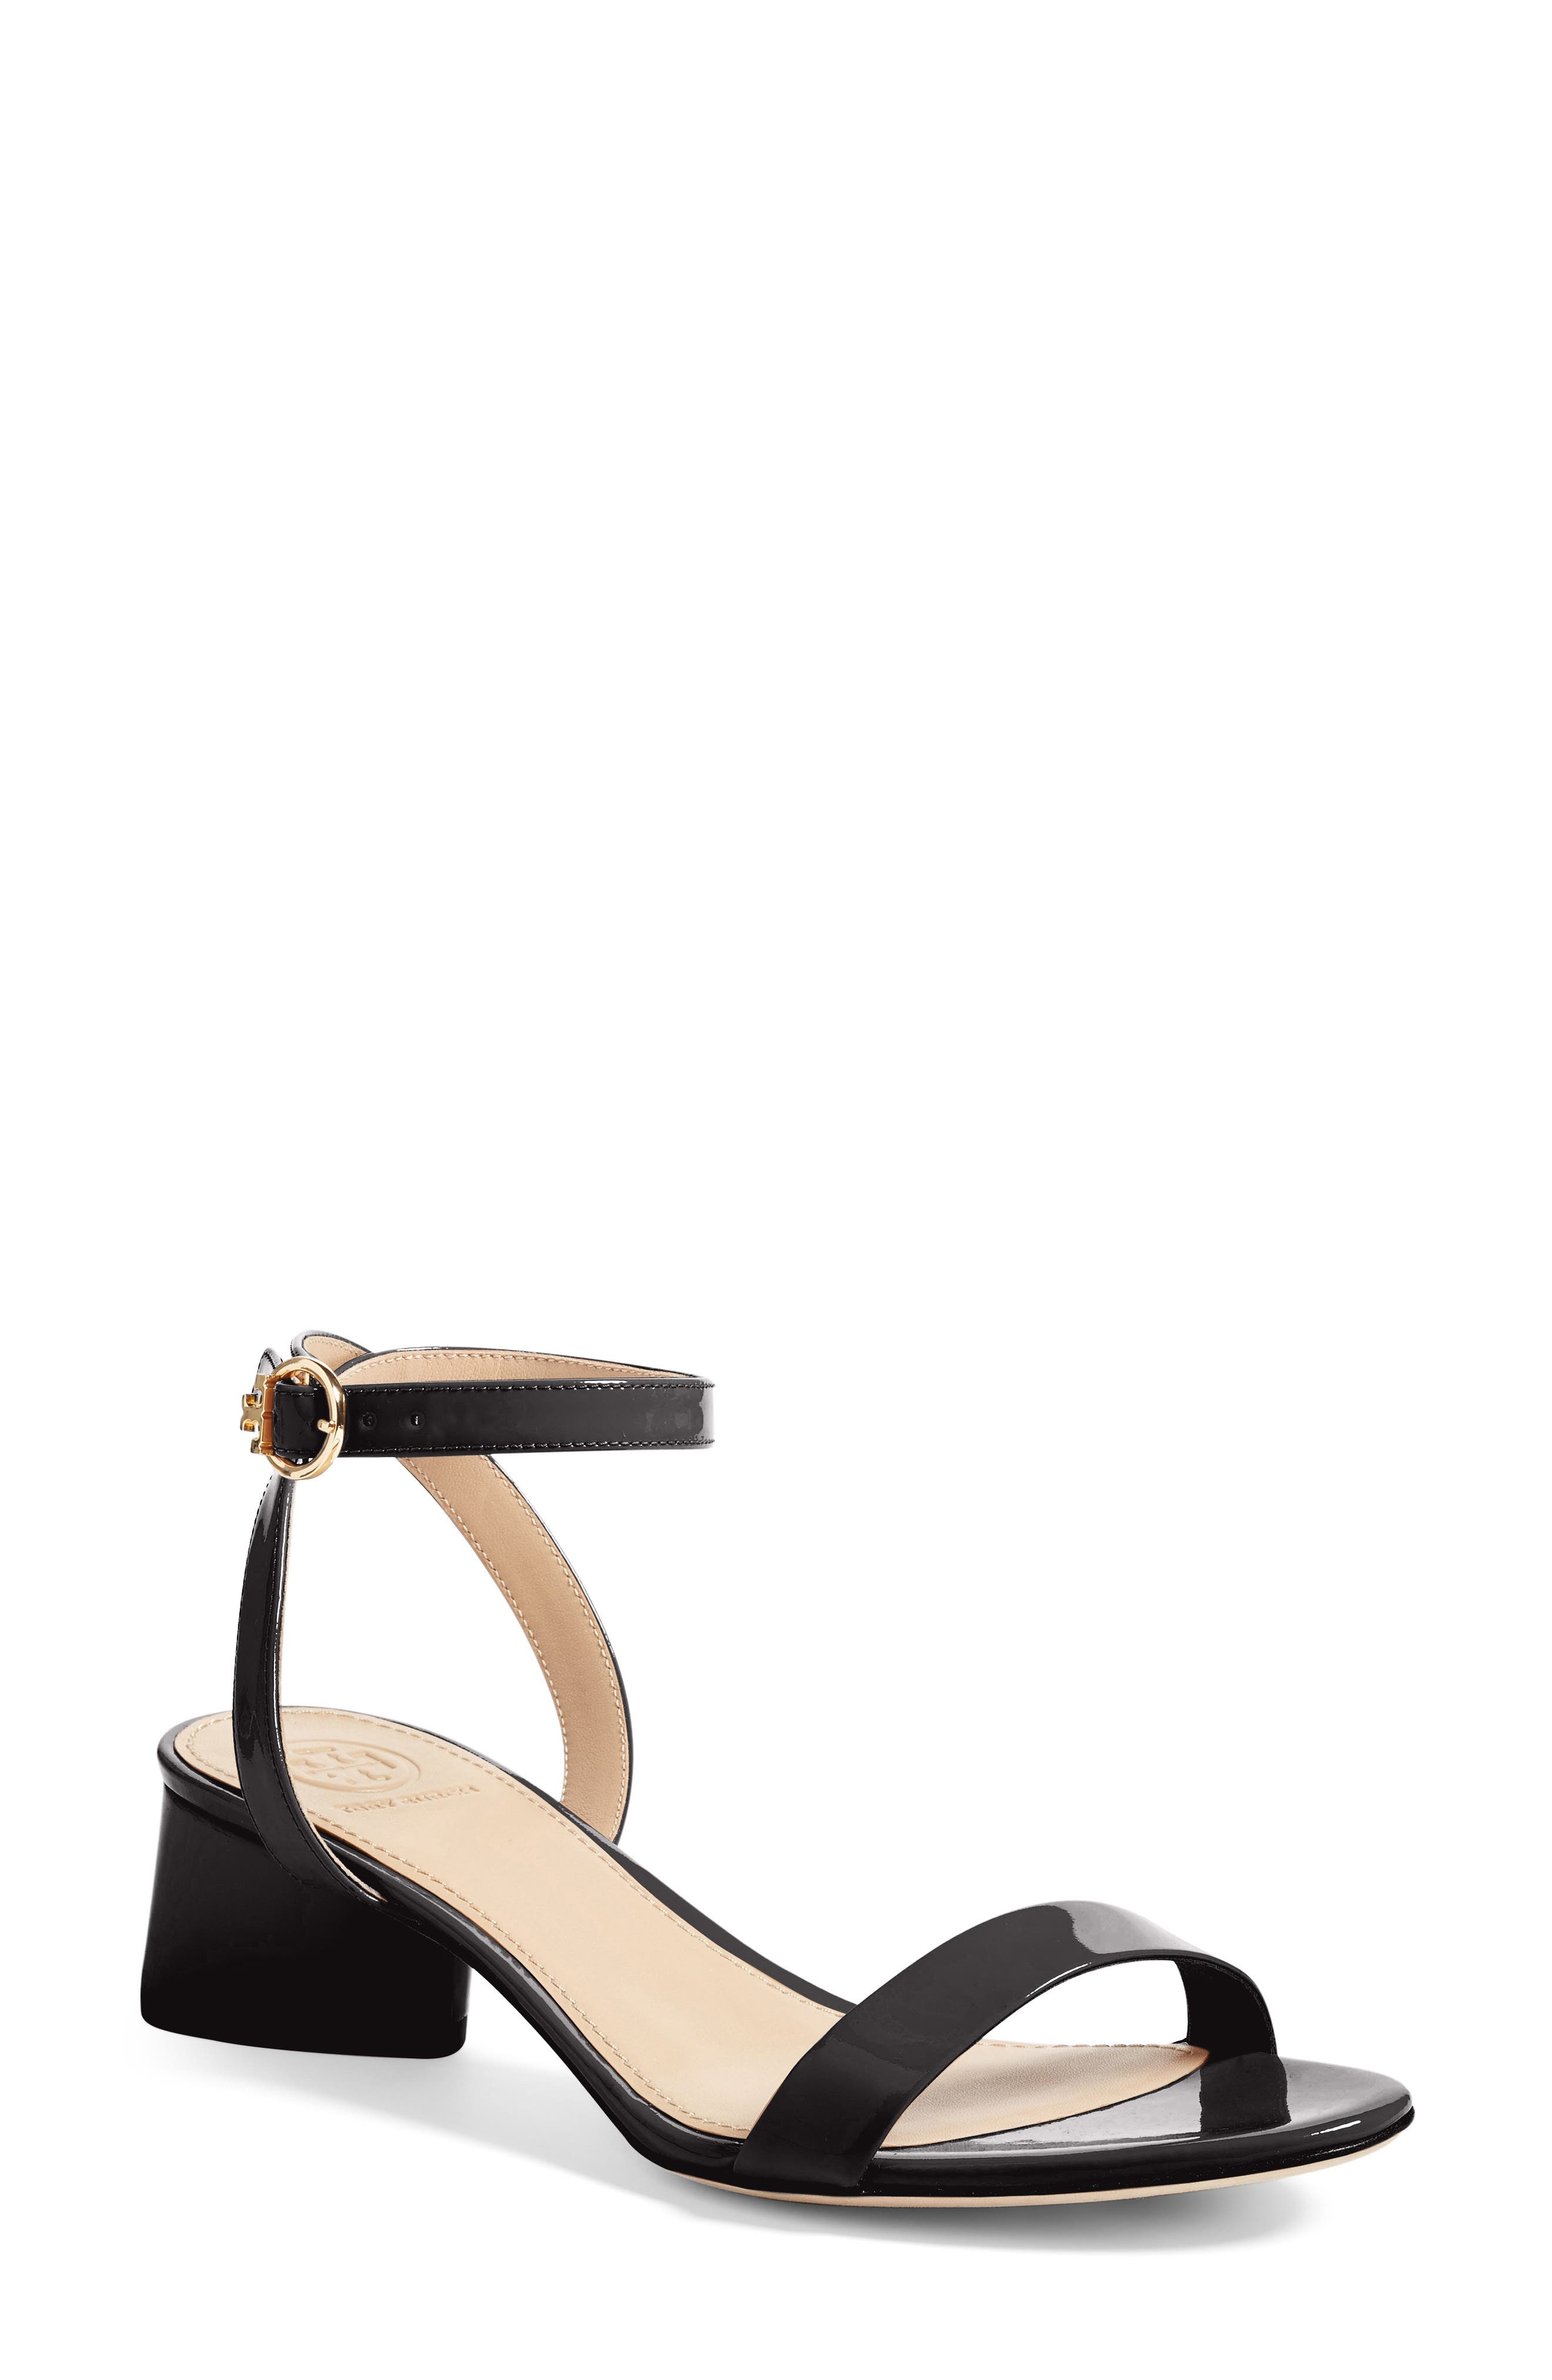 Elizabeth Block Heel Sandal,                         Main,                         color,